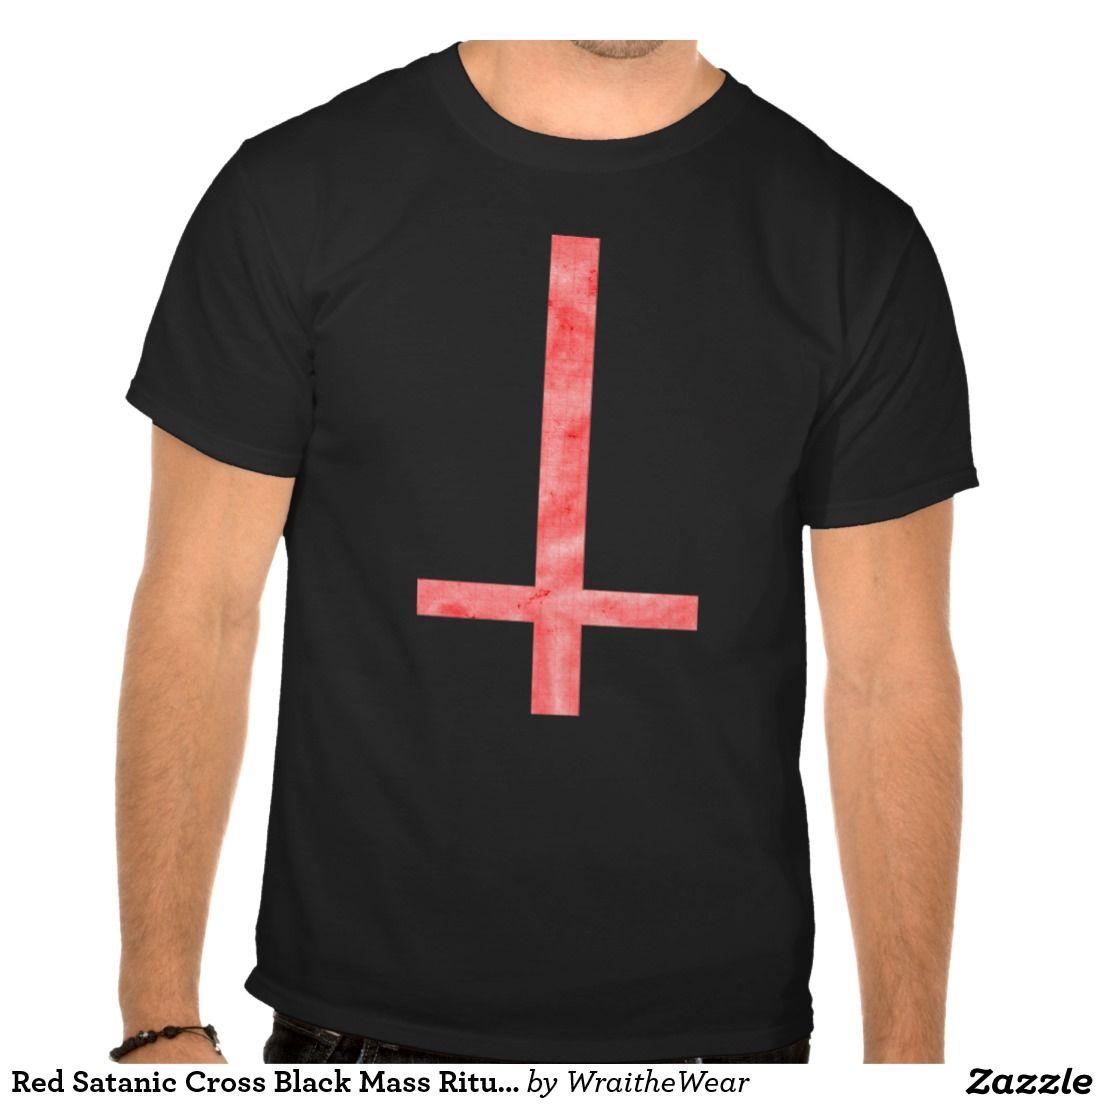 Red Satanic Cross Black Mass Ritual Symbol Tee  2531493bddb3c